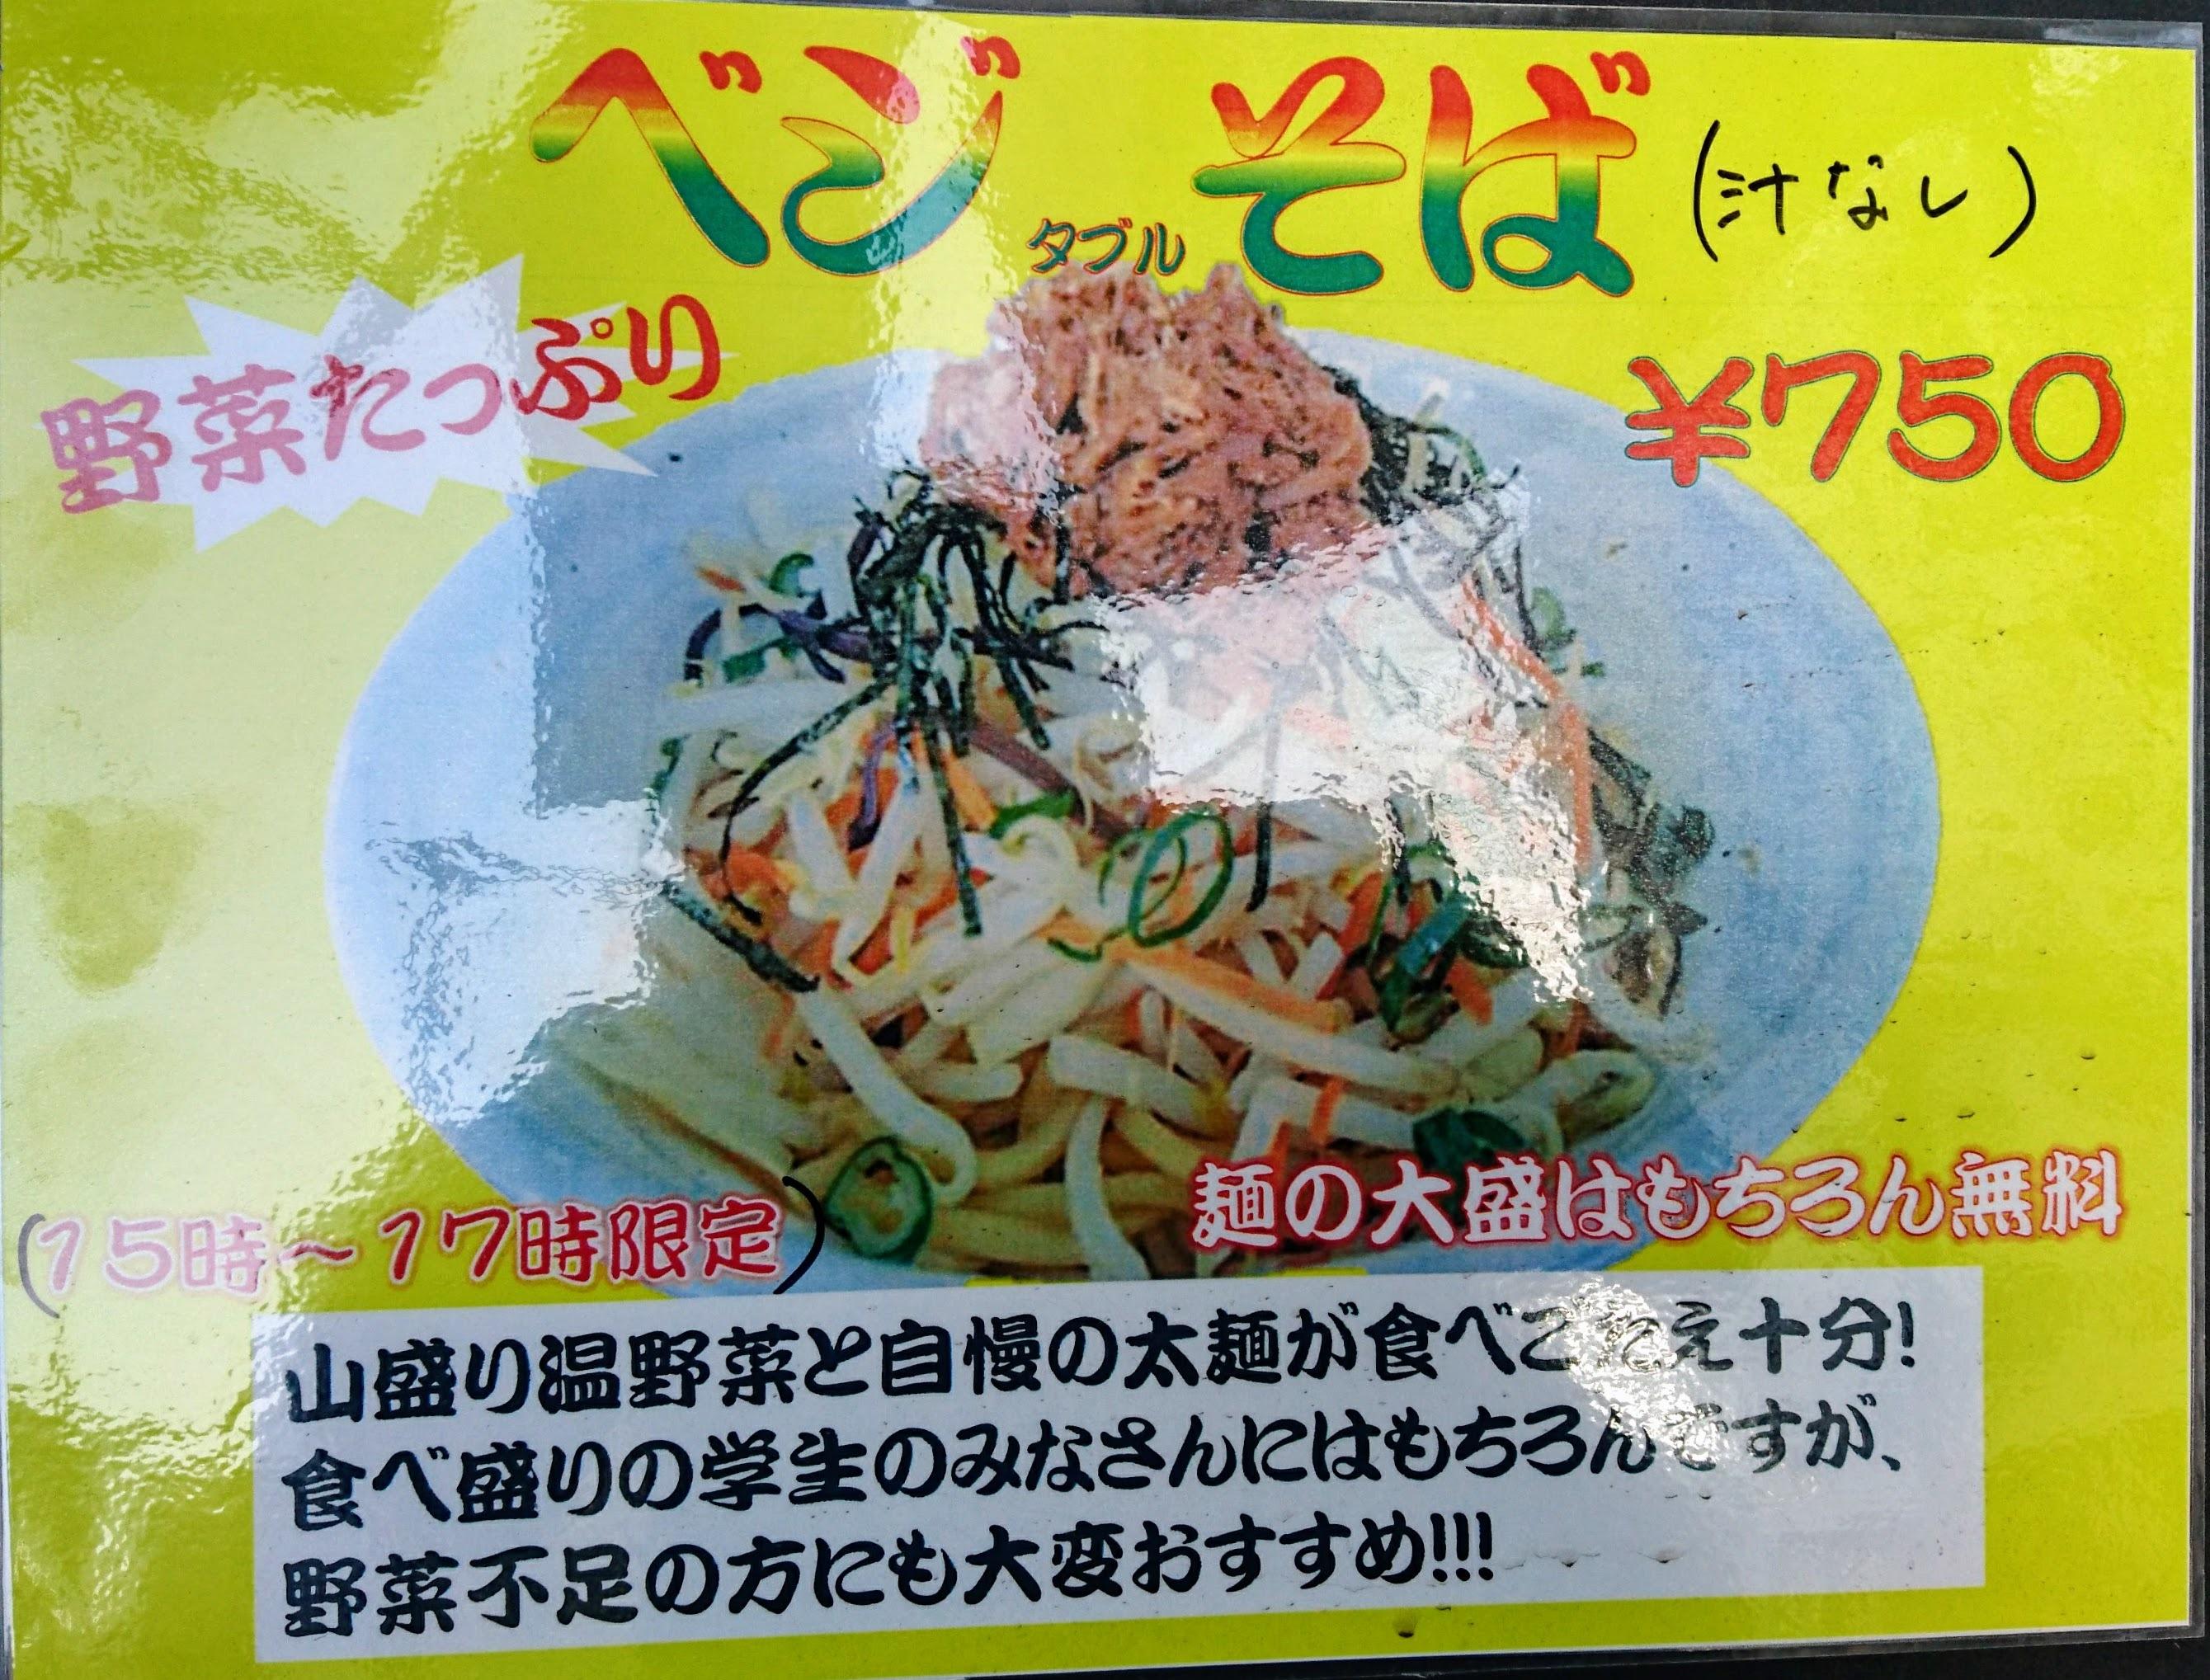 新作限定ベジそば麺彩房五反田店@品川区西五反田1−23−7